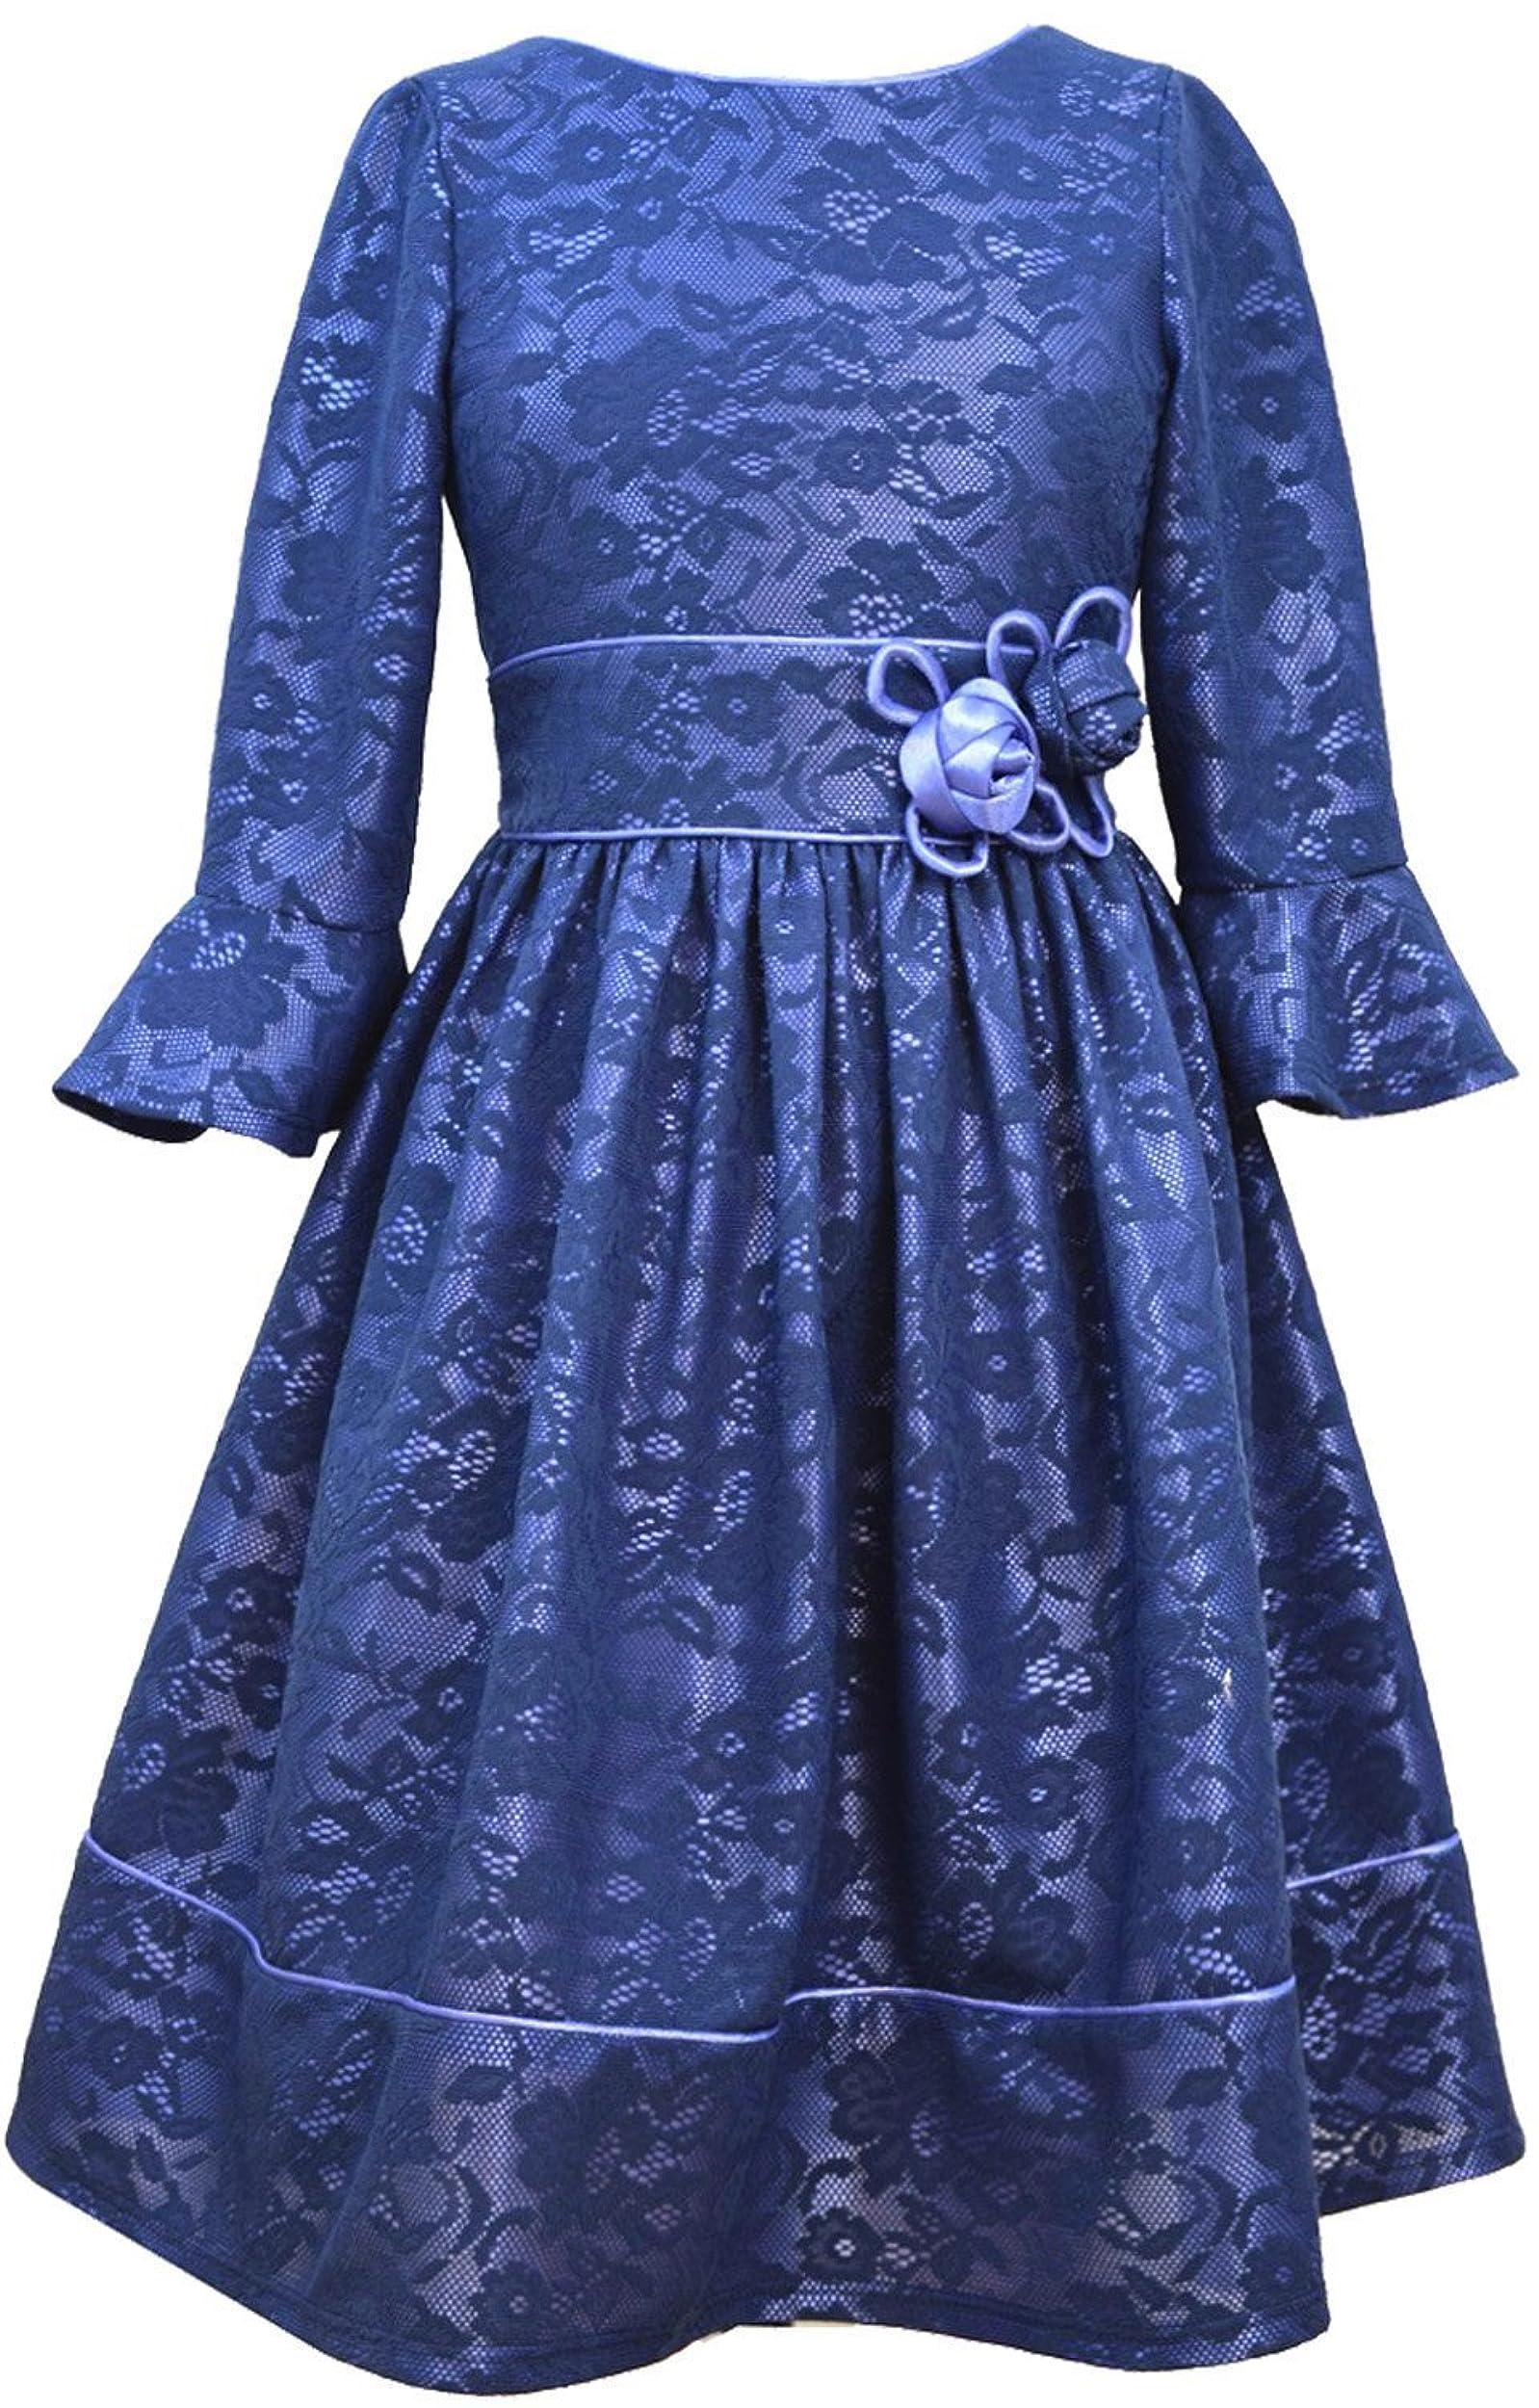 c0a40e05cc7 Details about Big Girls Tween 7-16 Navy-Blue Bell Bonded Lace Social Party  Dress